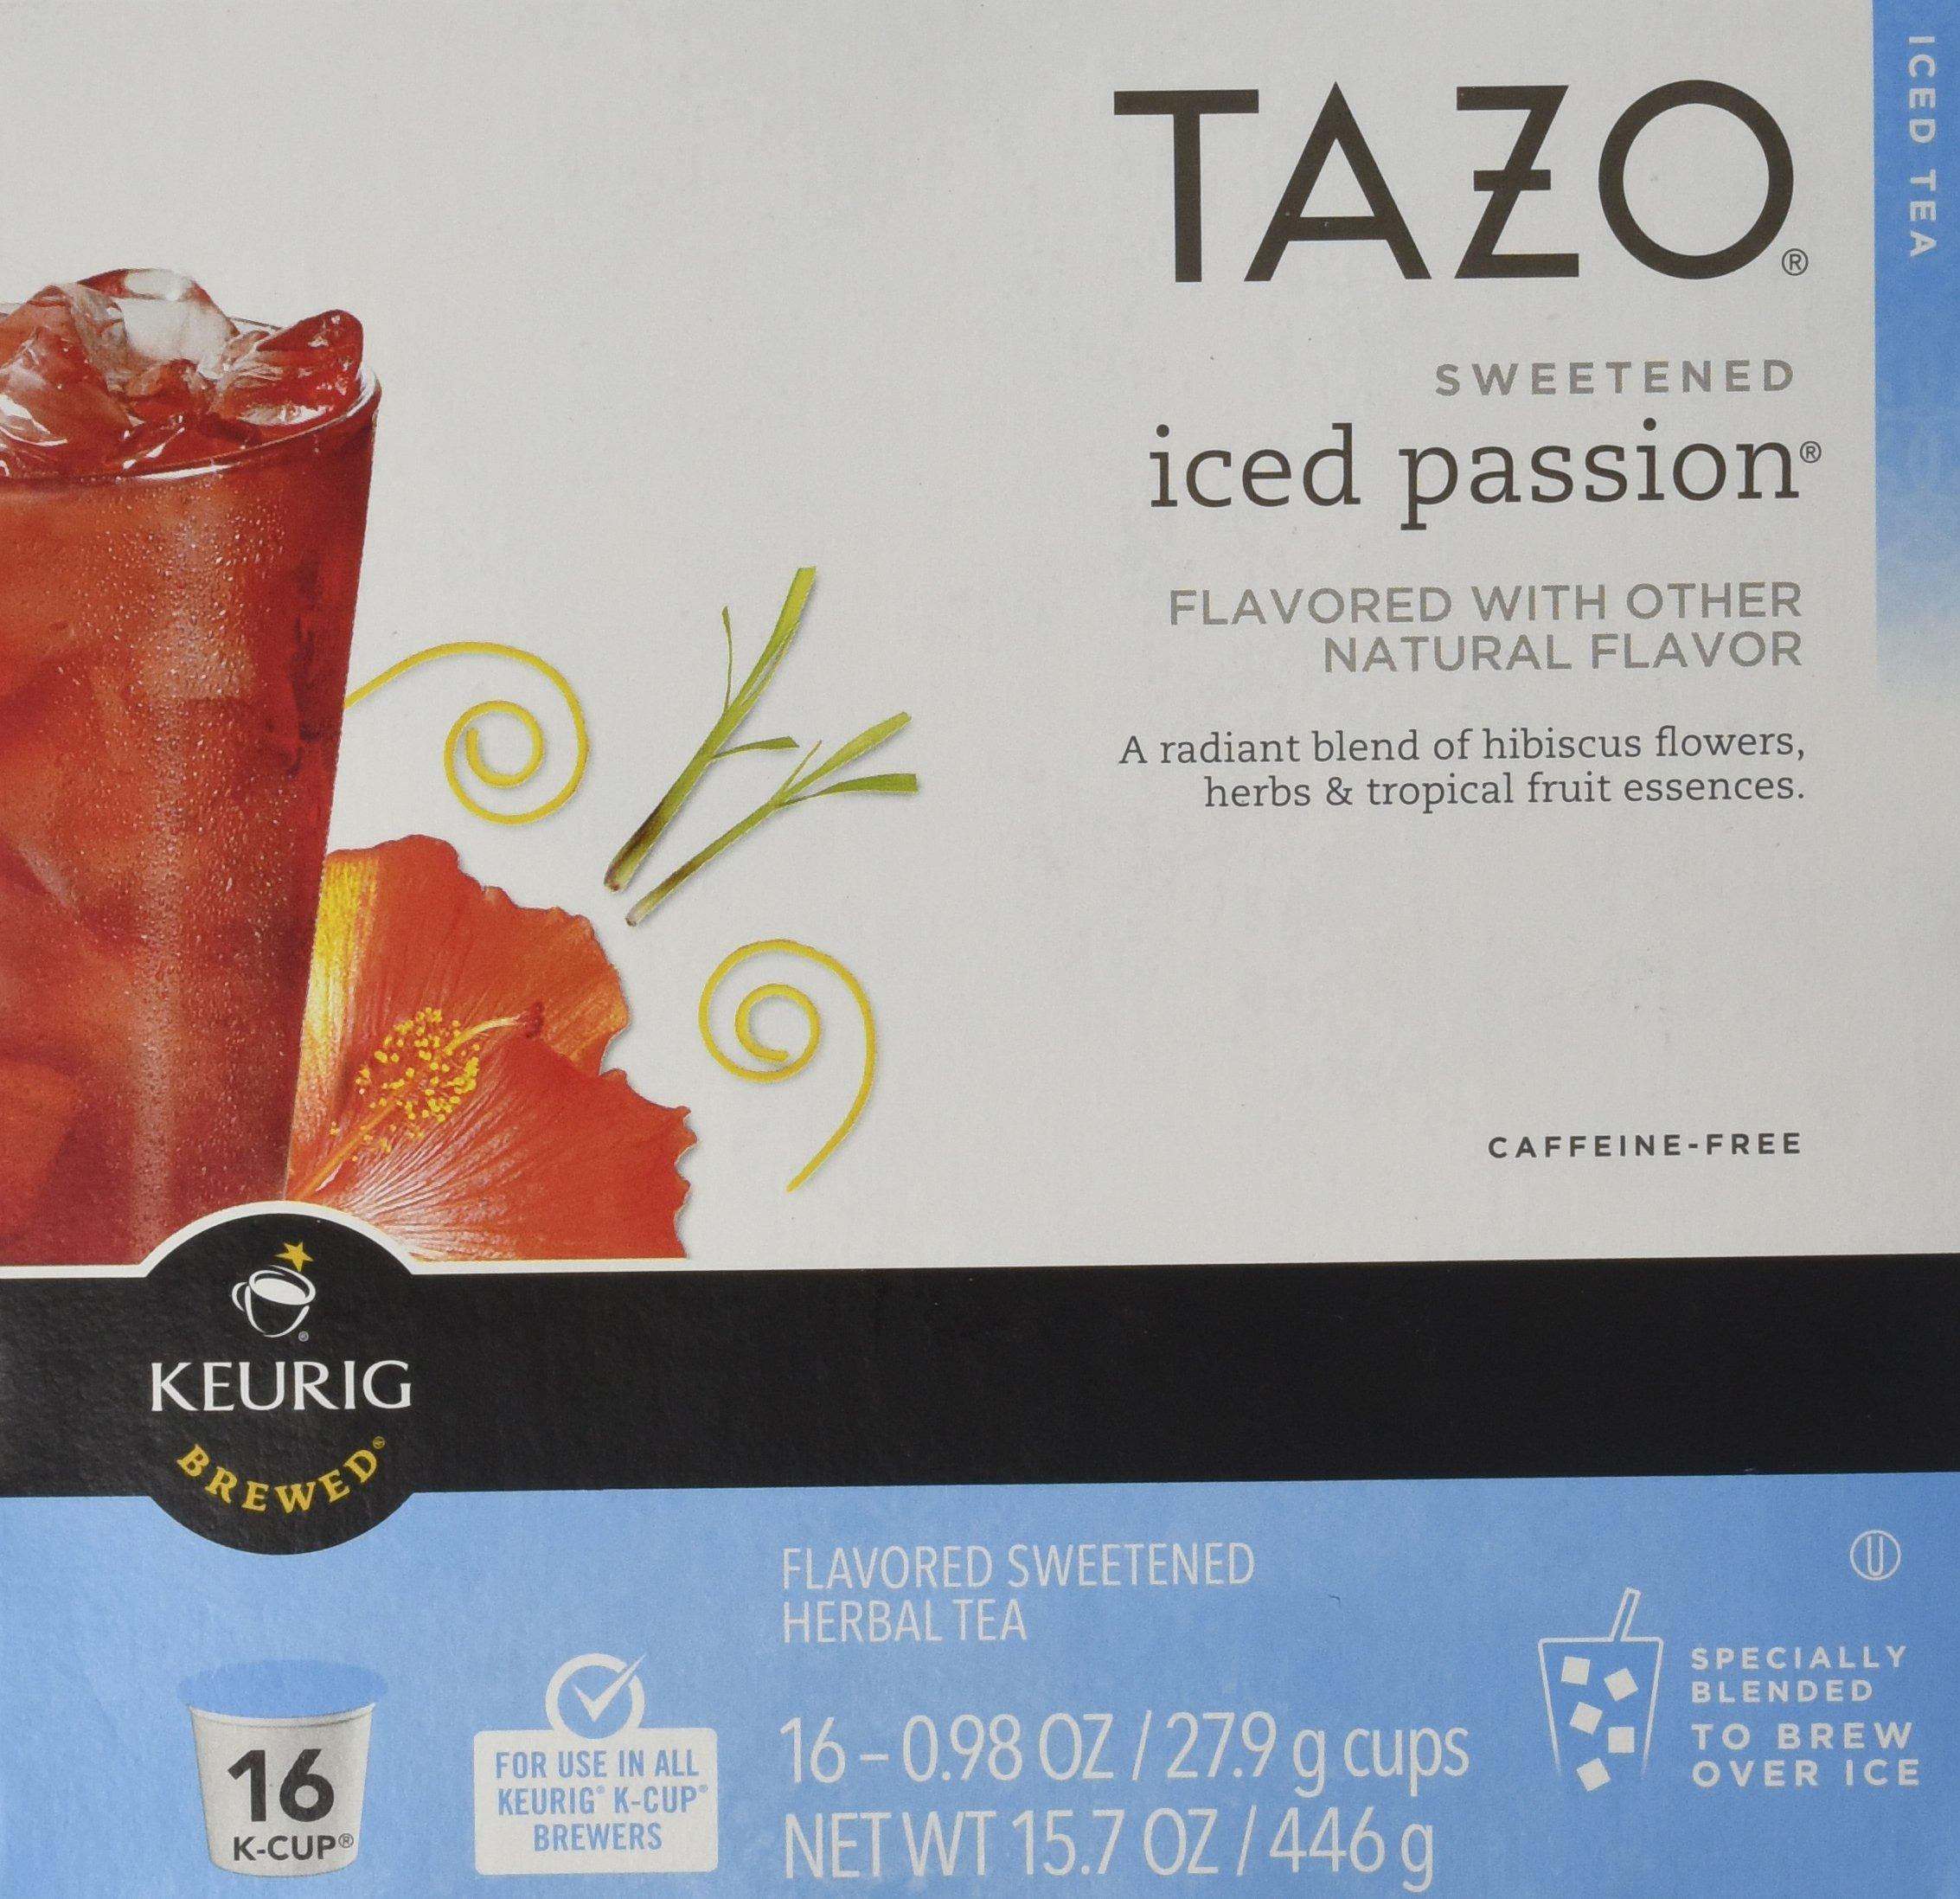 Keurig Tazo Sweetened Iced Passion Tea K-cup 16 Ct